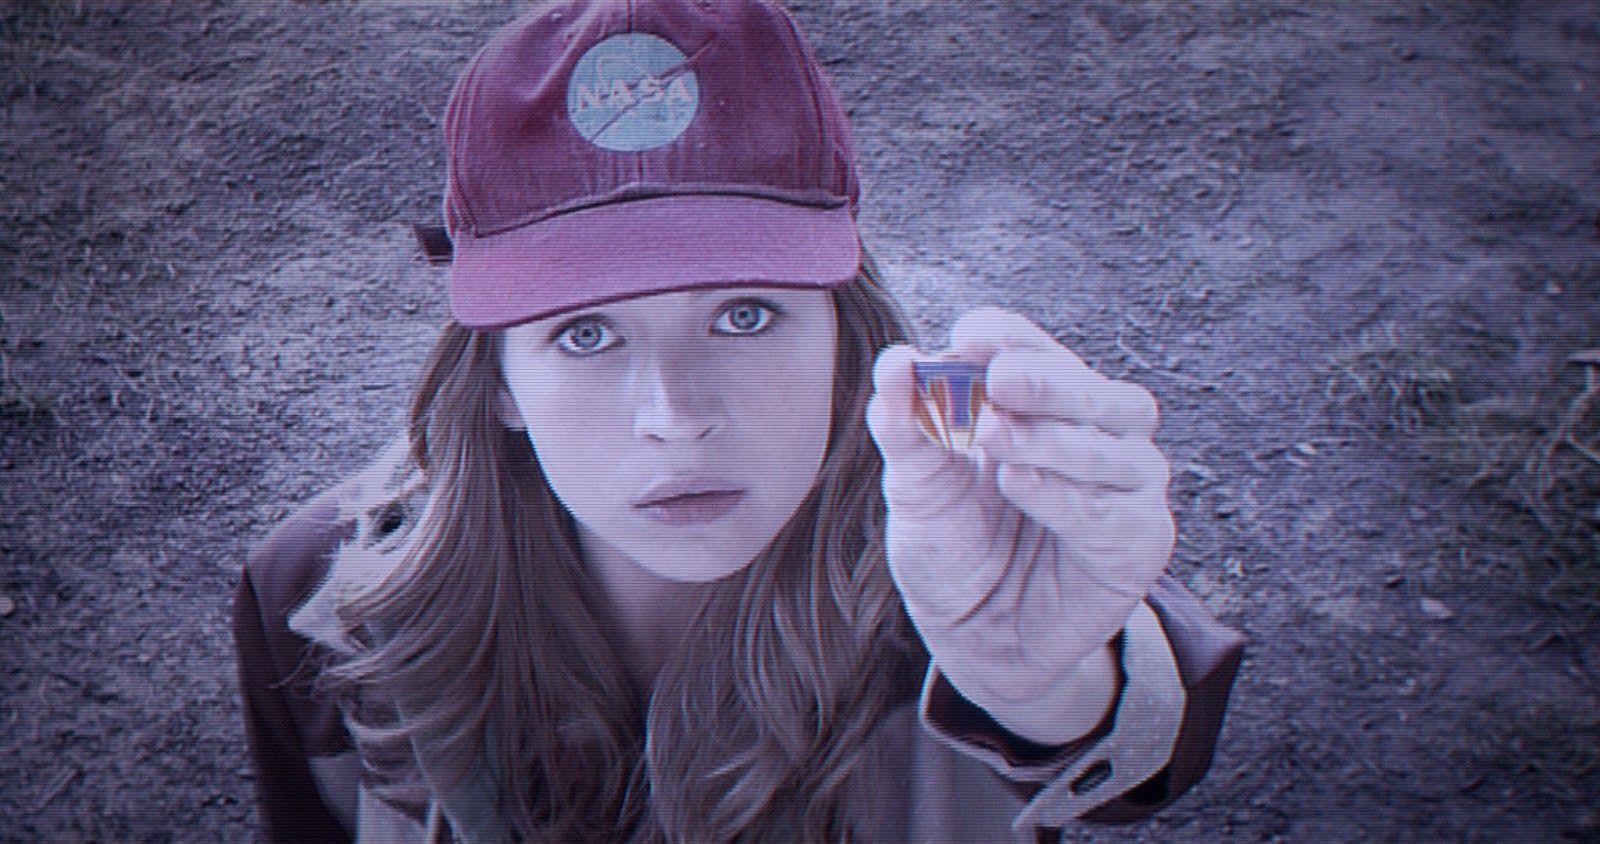 Tomorrowland Movie Image 9